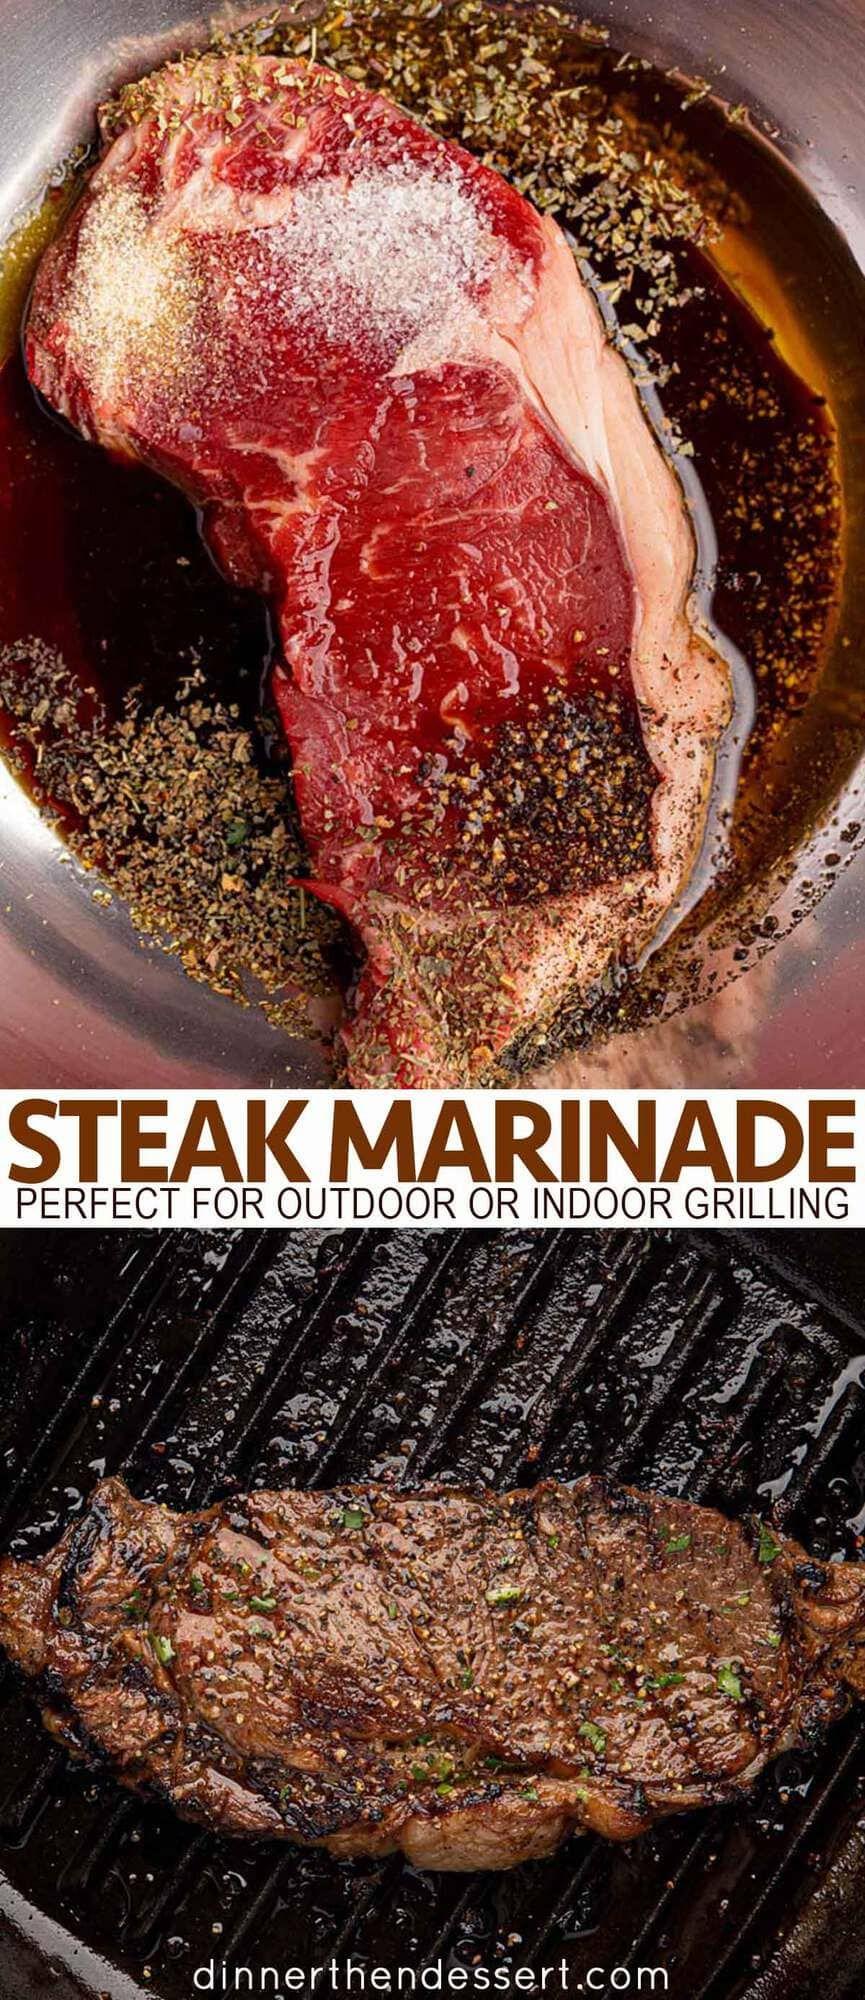 The BEST Ever Steak Marinade - Dinner, then Dessert